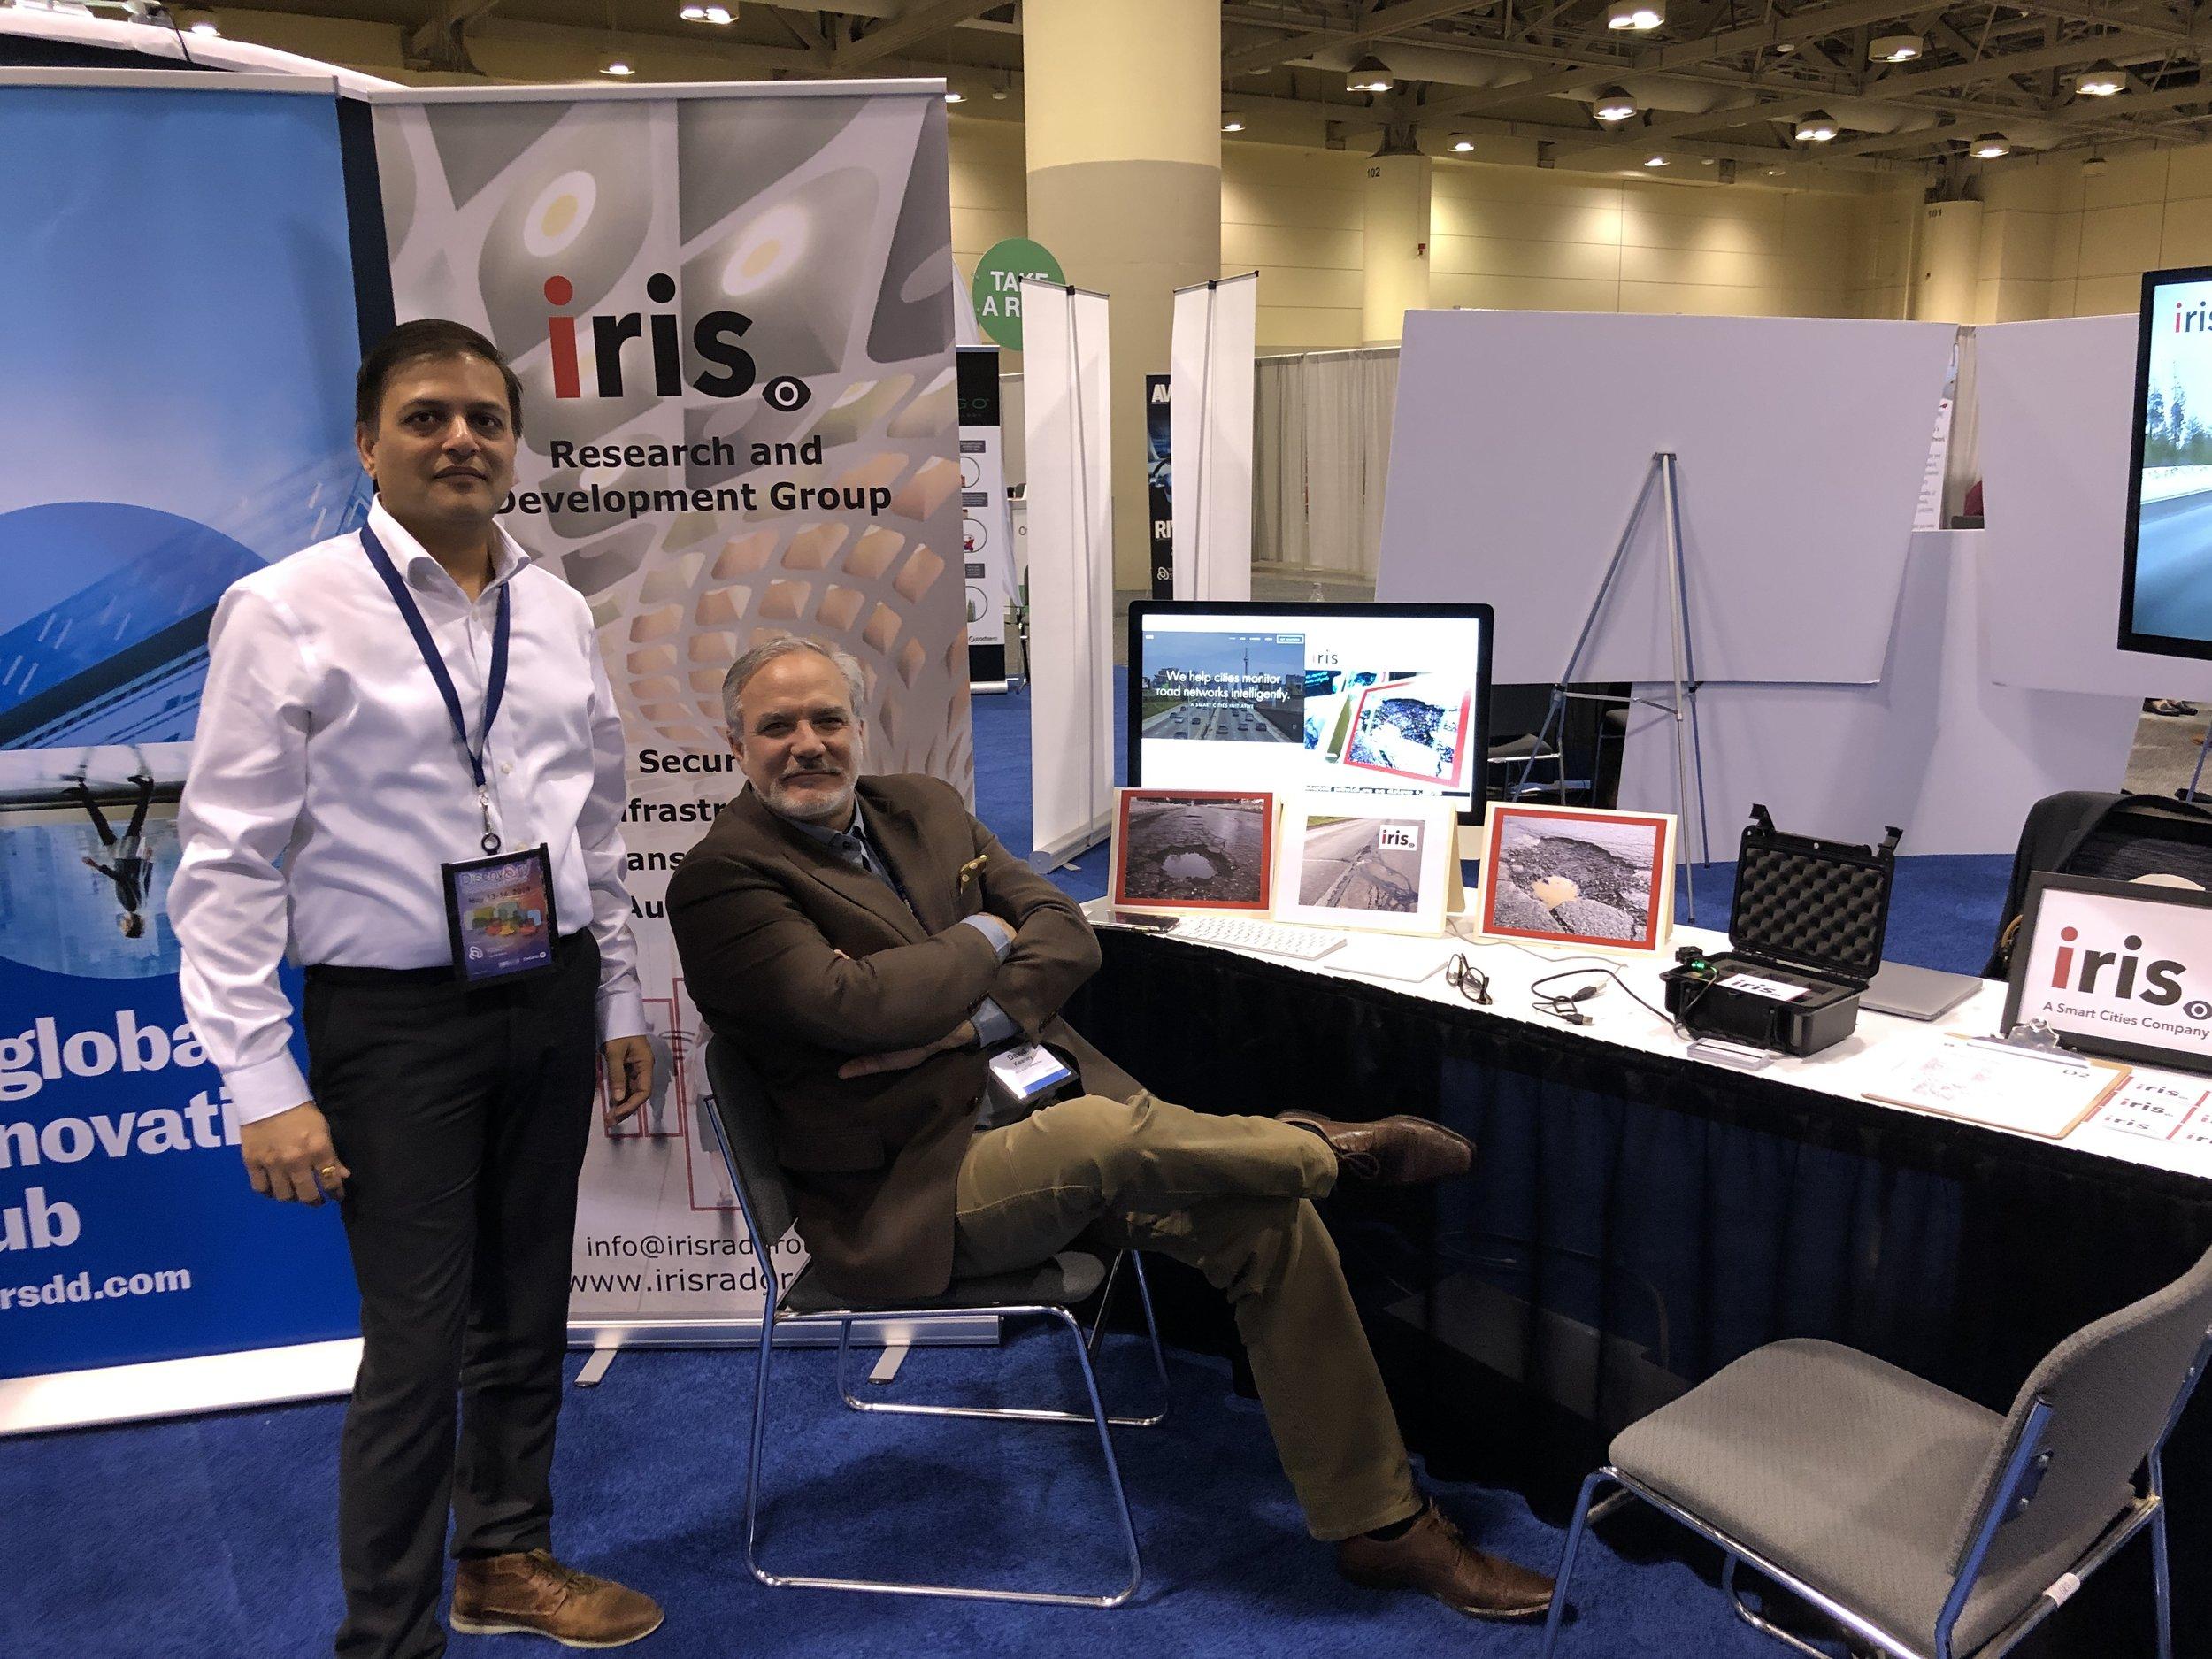 David Keaney CFO, and Saurabh Mahajan COO at the IRIS booth next to MaRS Toronto RTDS Booth.